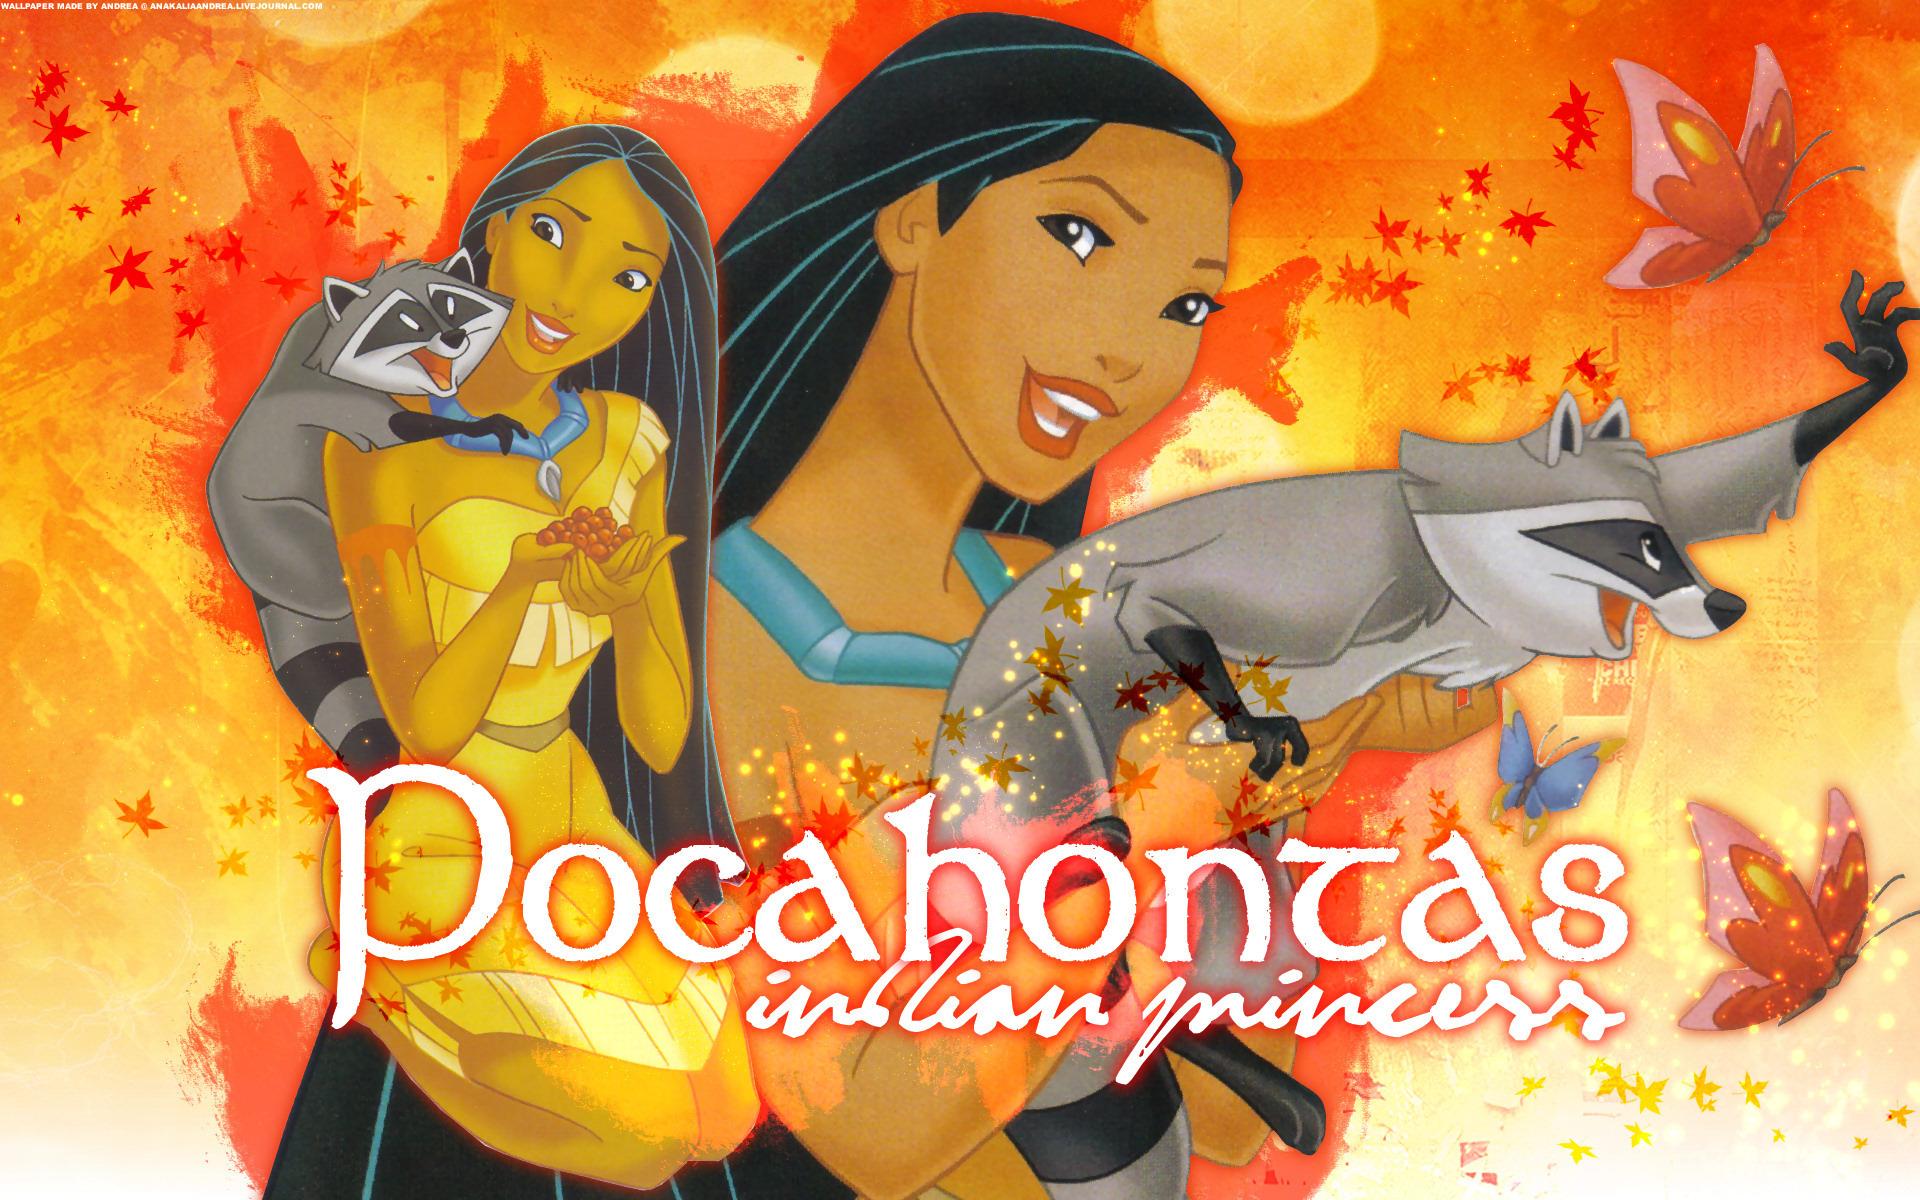 Pocahontas - 1920x1200